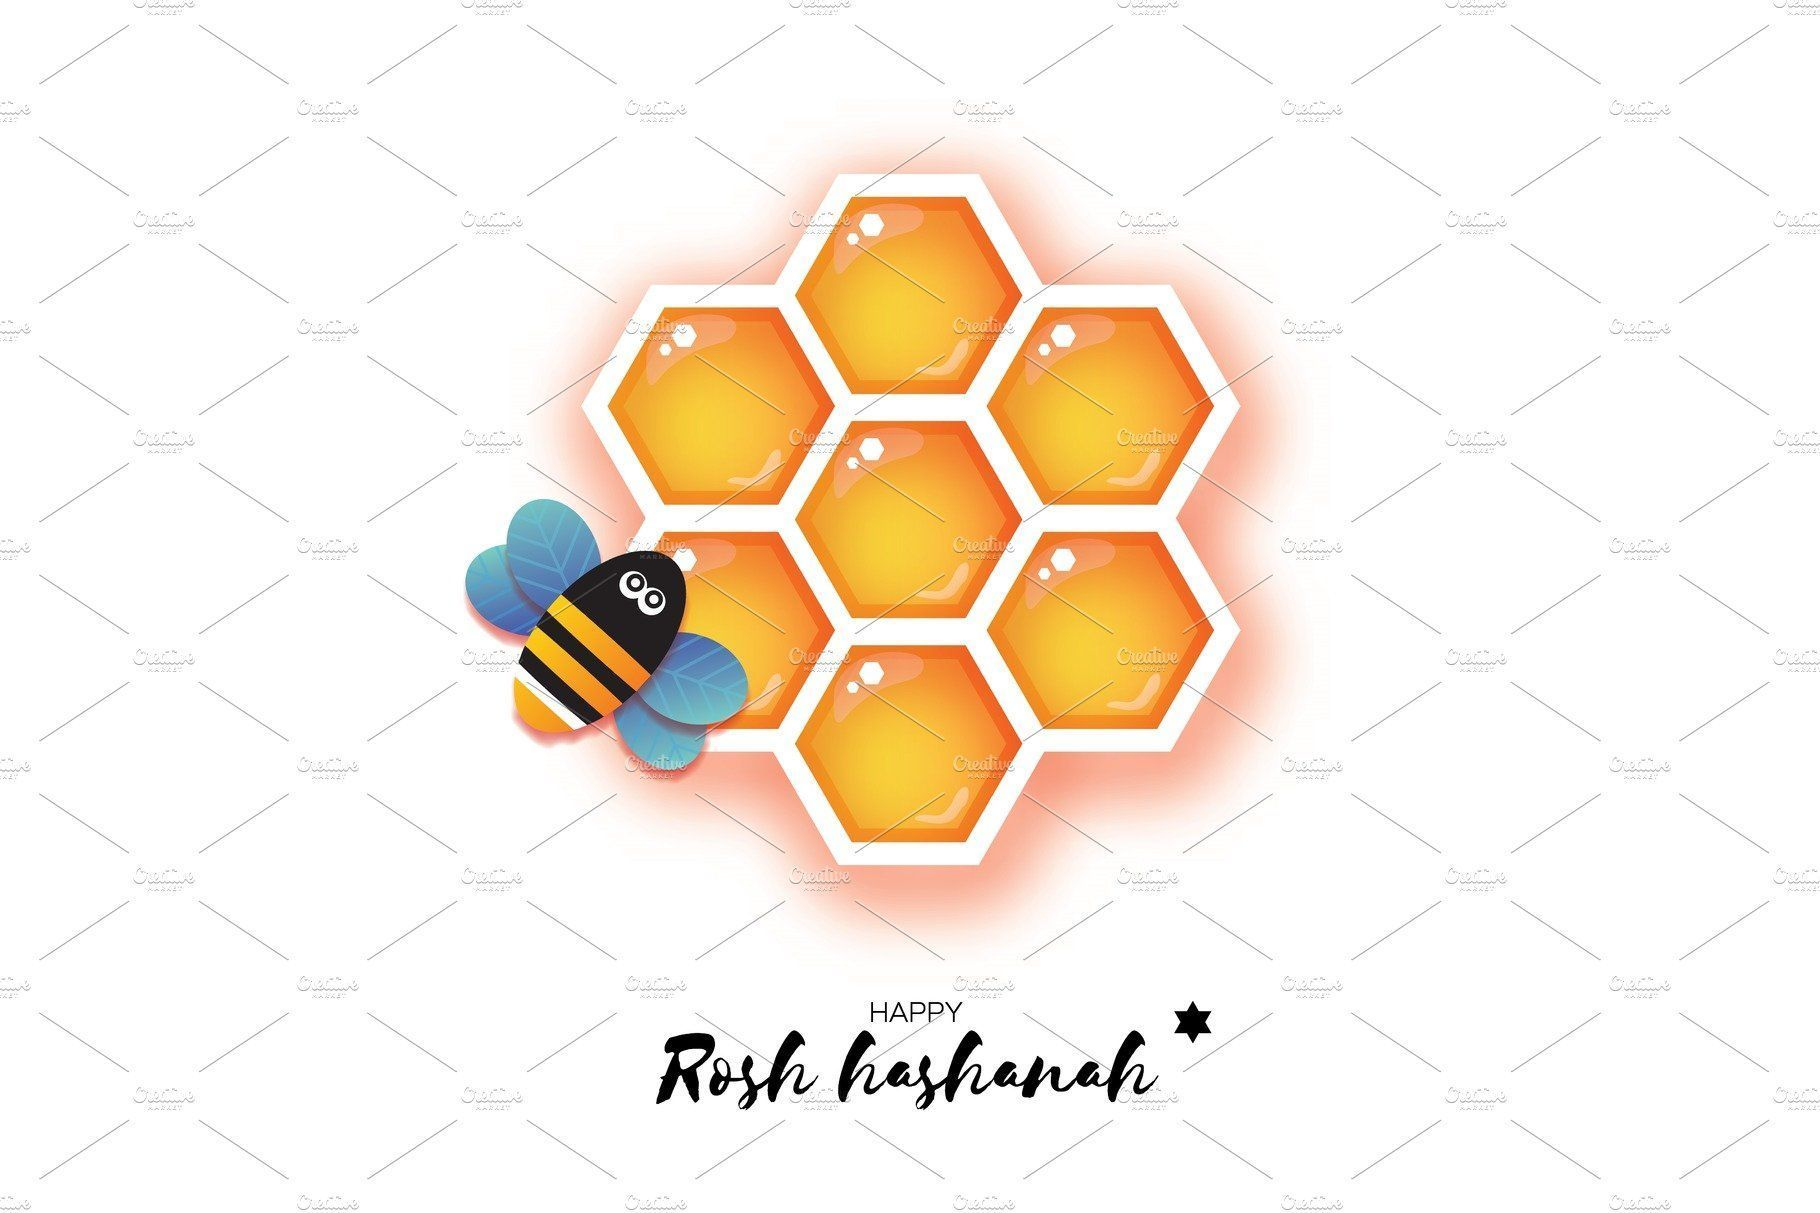 Jewish New Year, Rosh Hashanah , #Aff, #Origami#card#Hexagon#gold #Ad #shanatovacards Jewish New Year, Rosh Hashanah , #Aff, #Origami#card#Hexagon#gold #Ad #happyroshhashanah Jewish New Year, Rosh Hashanah , #Aff, #Origami#card#Hexagon#gold #Ad #shanatovacards Jewish New Year, Rosh Hashanah , #Aff, #Origami#card#Hexagon#gold #Ad #happyroshhashanah